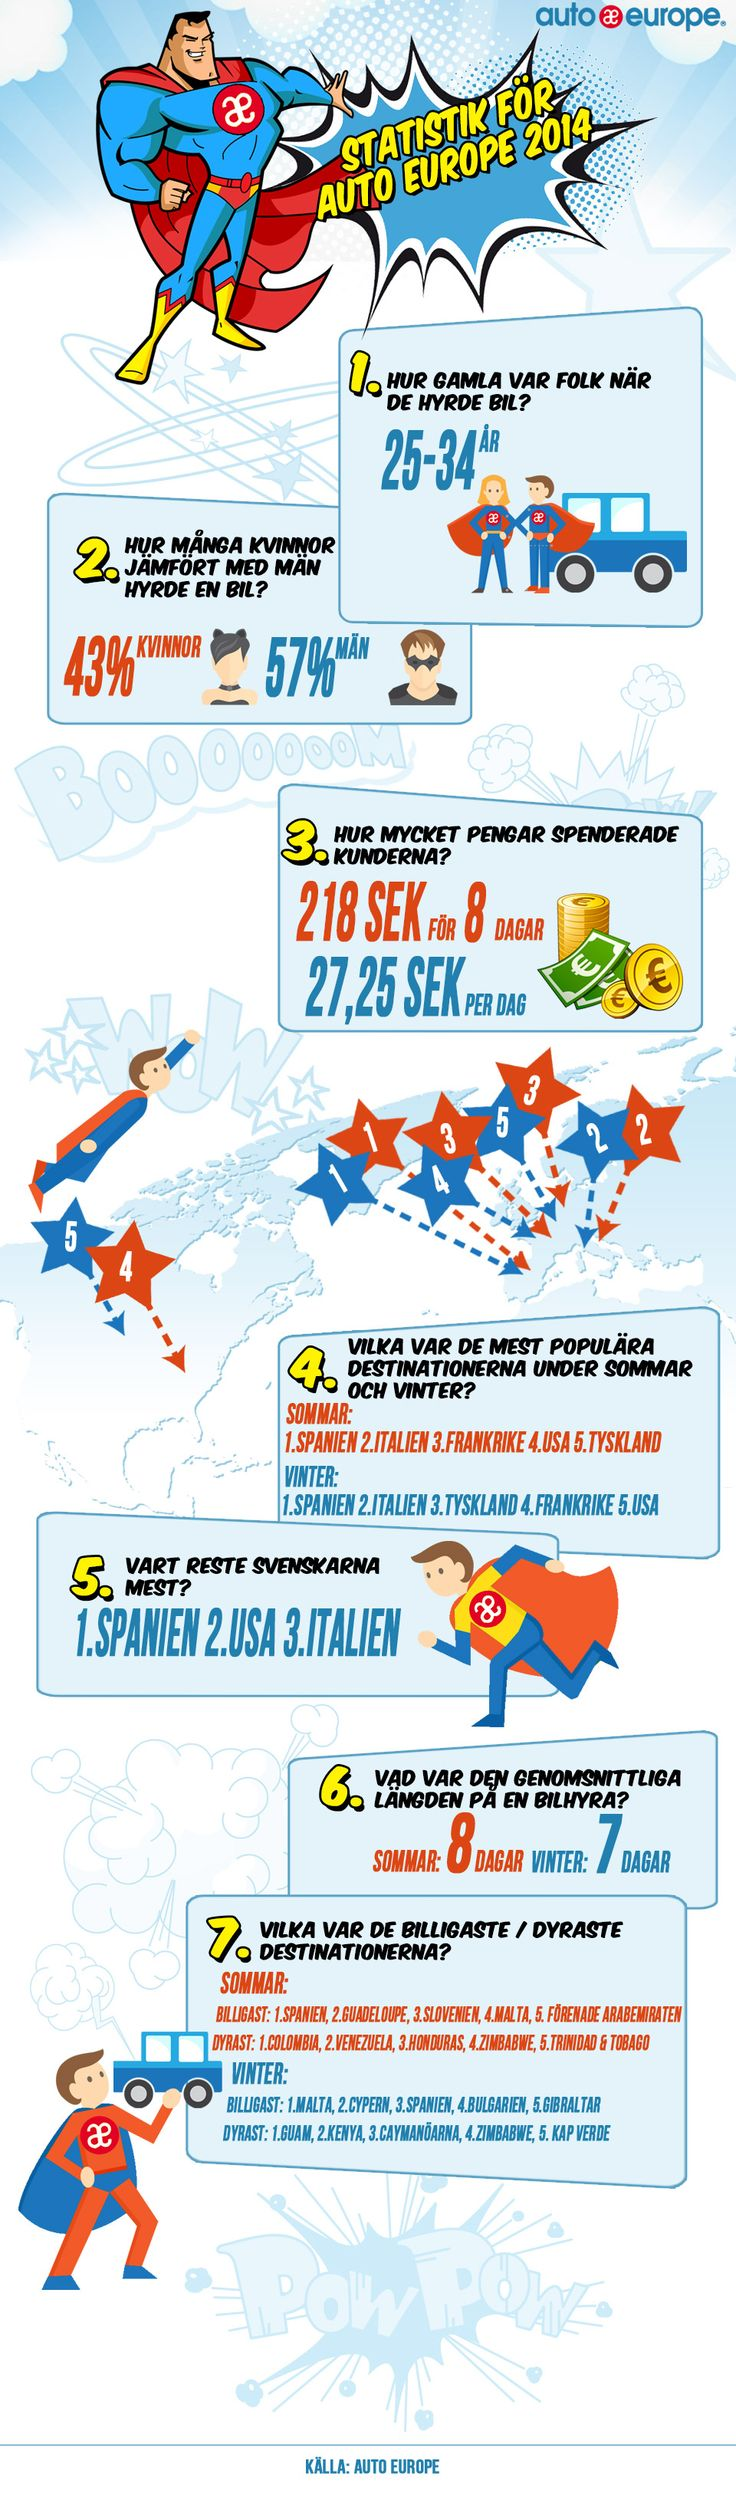 Auto Europe hyrbil - Statistik för Auto Europe 2014